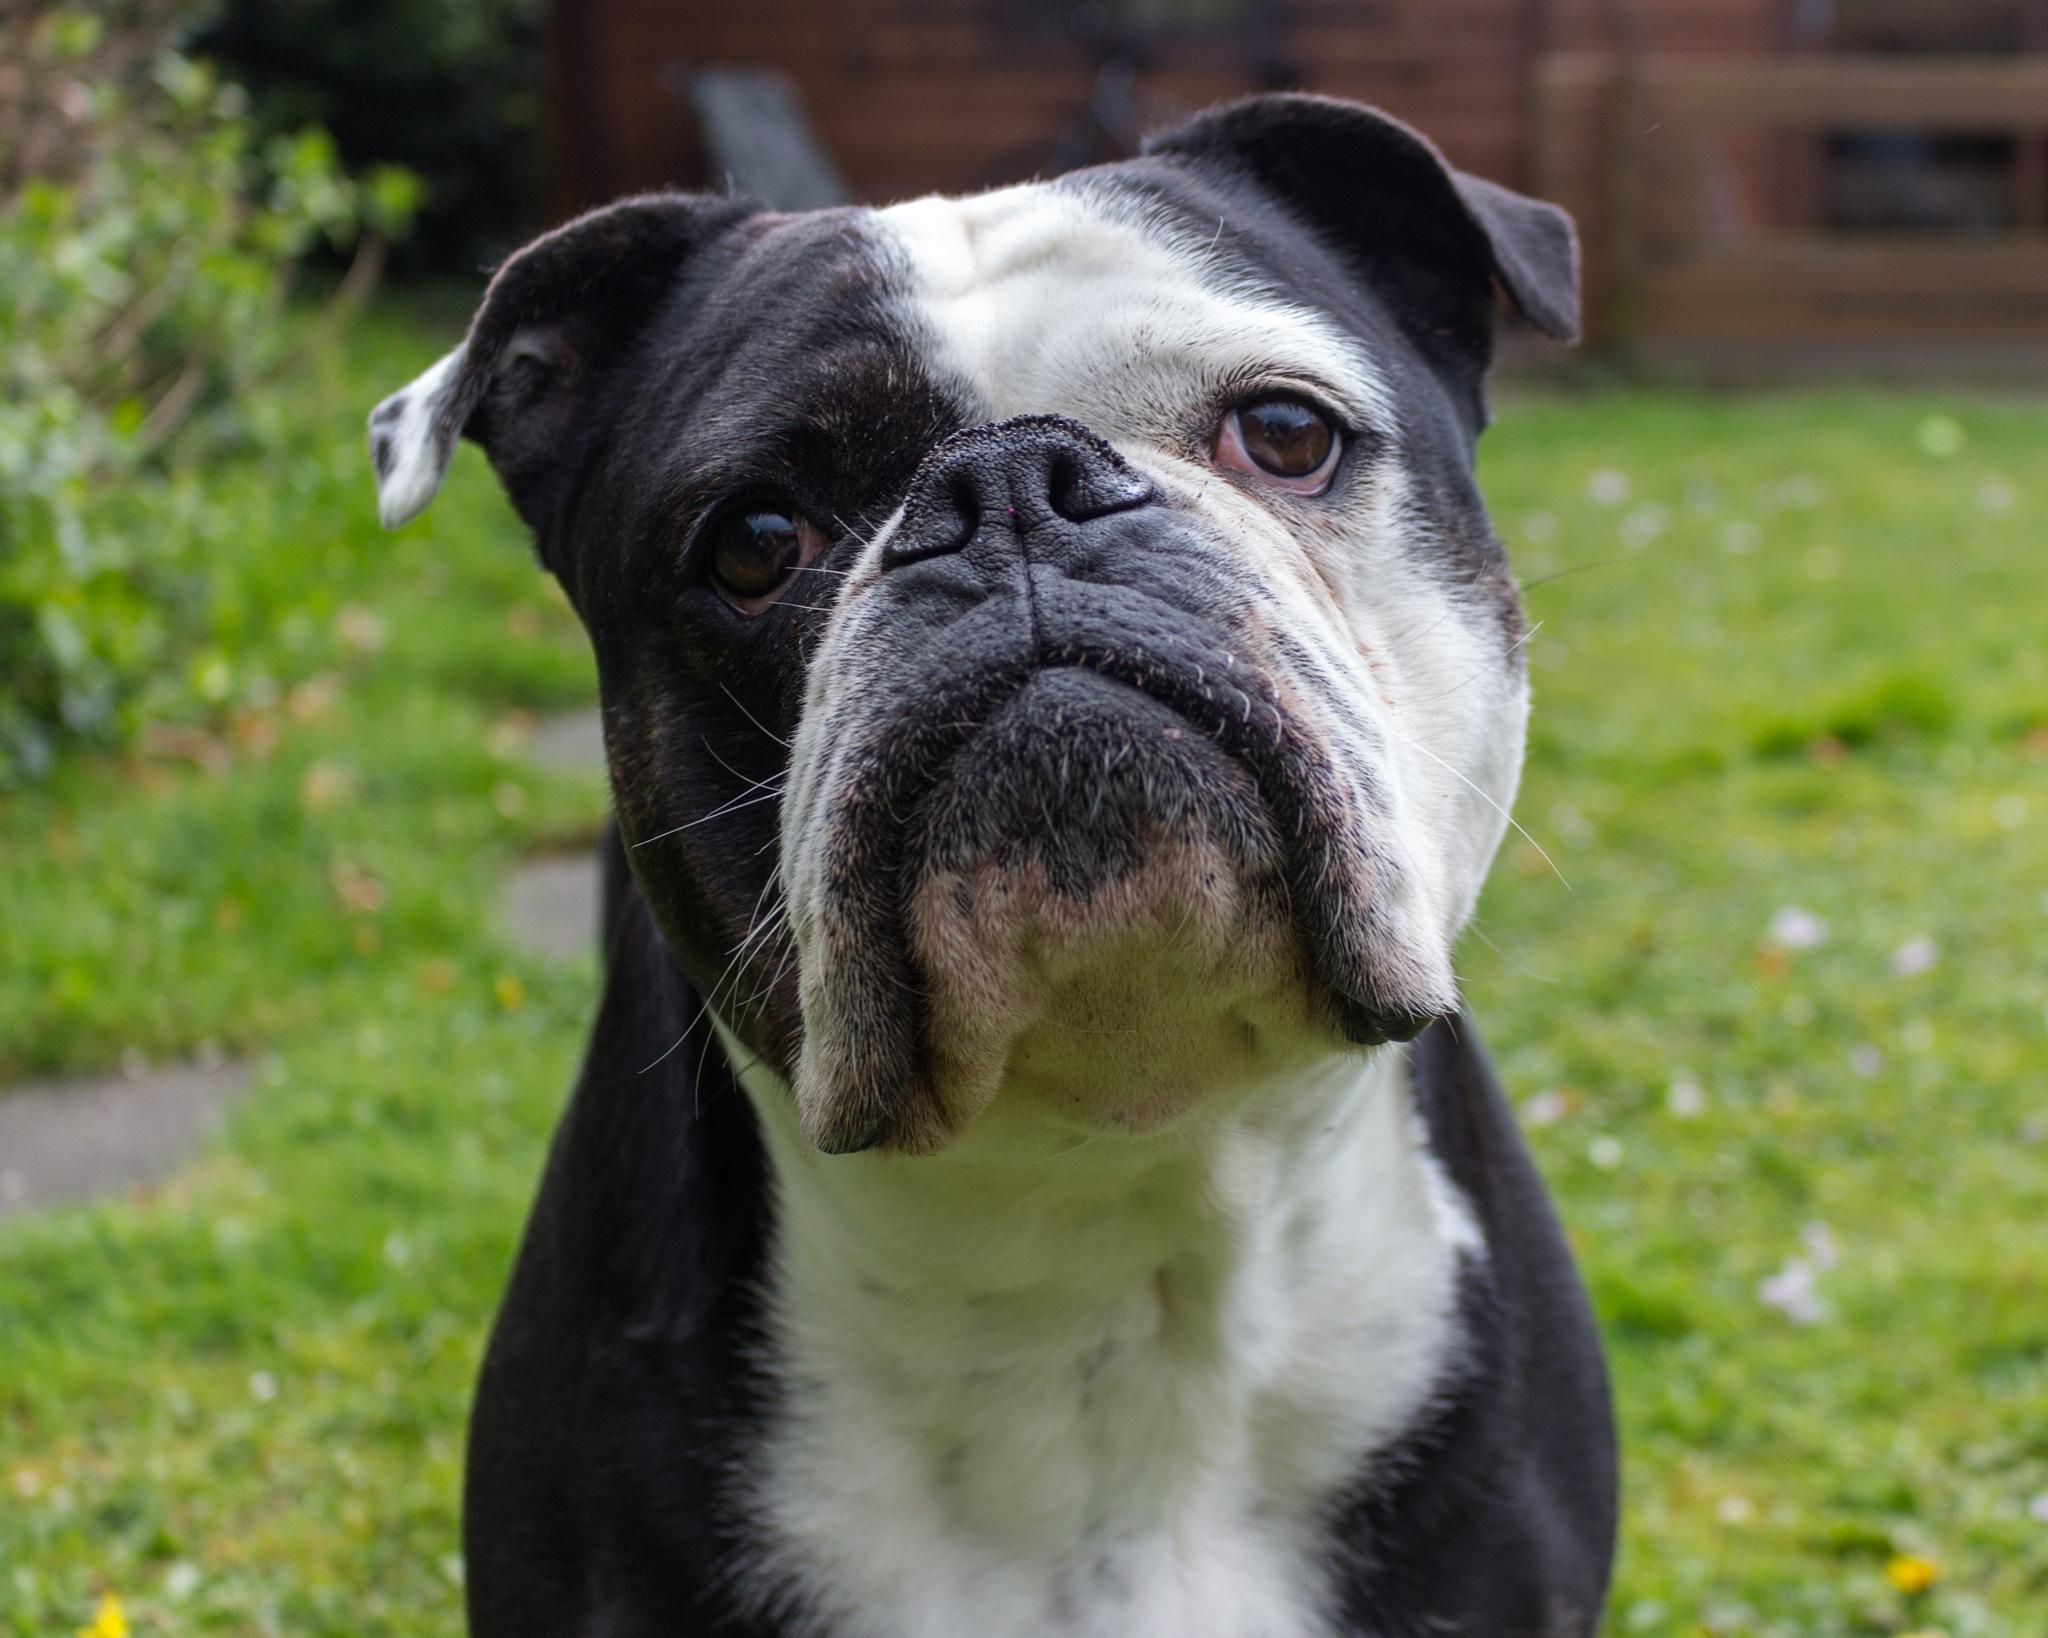 Luca the old English Bulldog by Fer Herwaarden